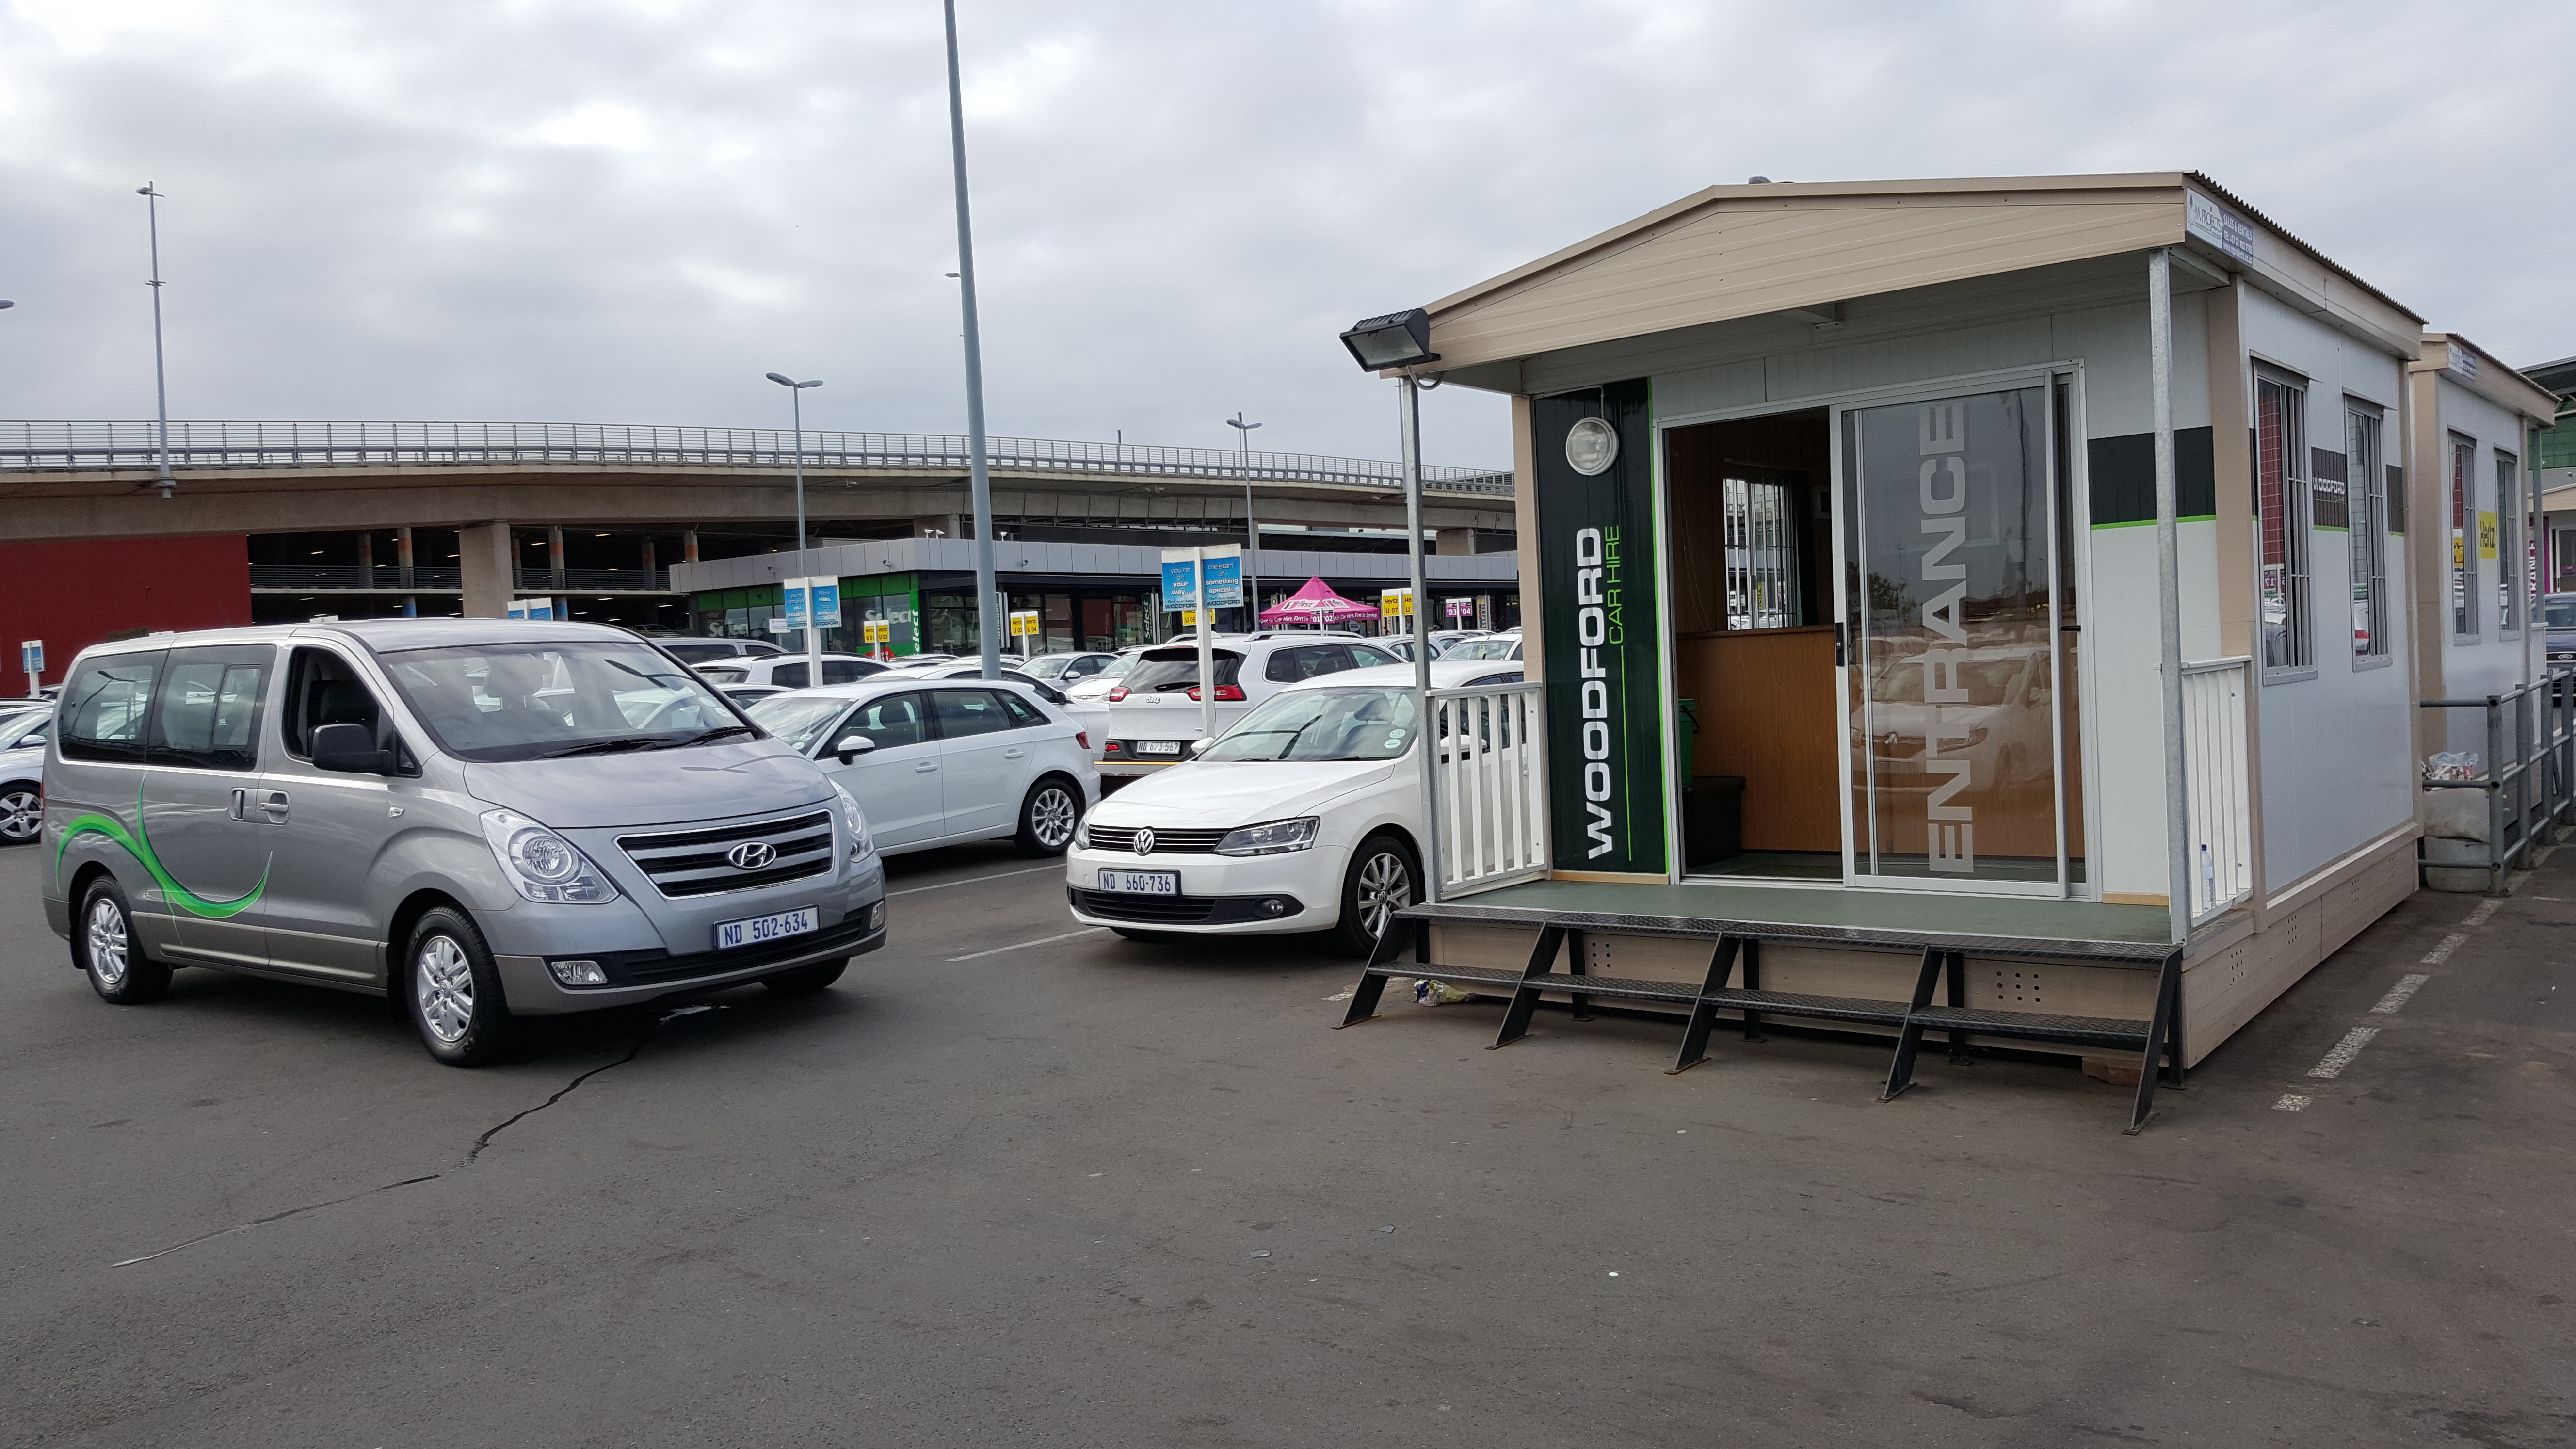 Capital Car Hire Cape Town Contact Details